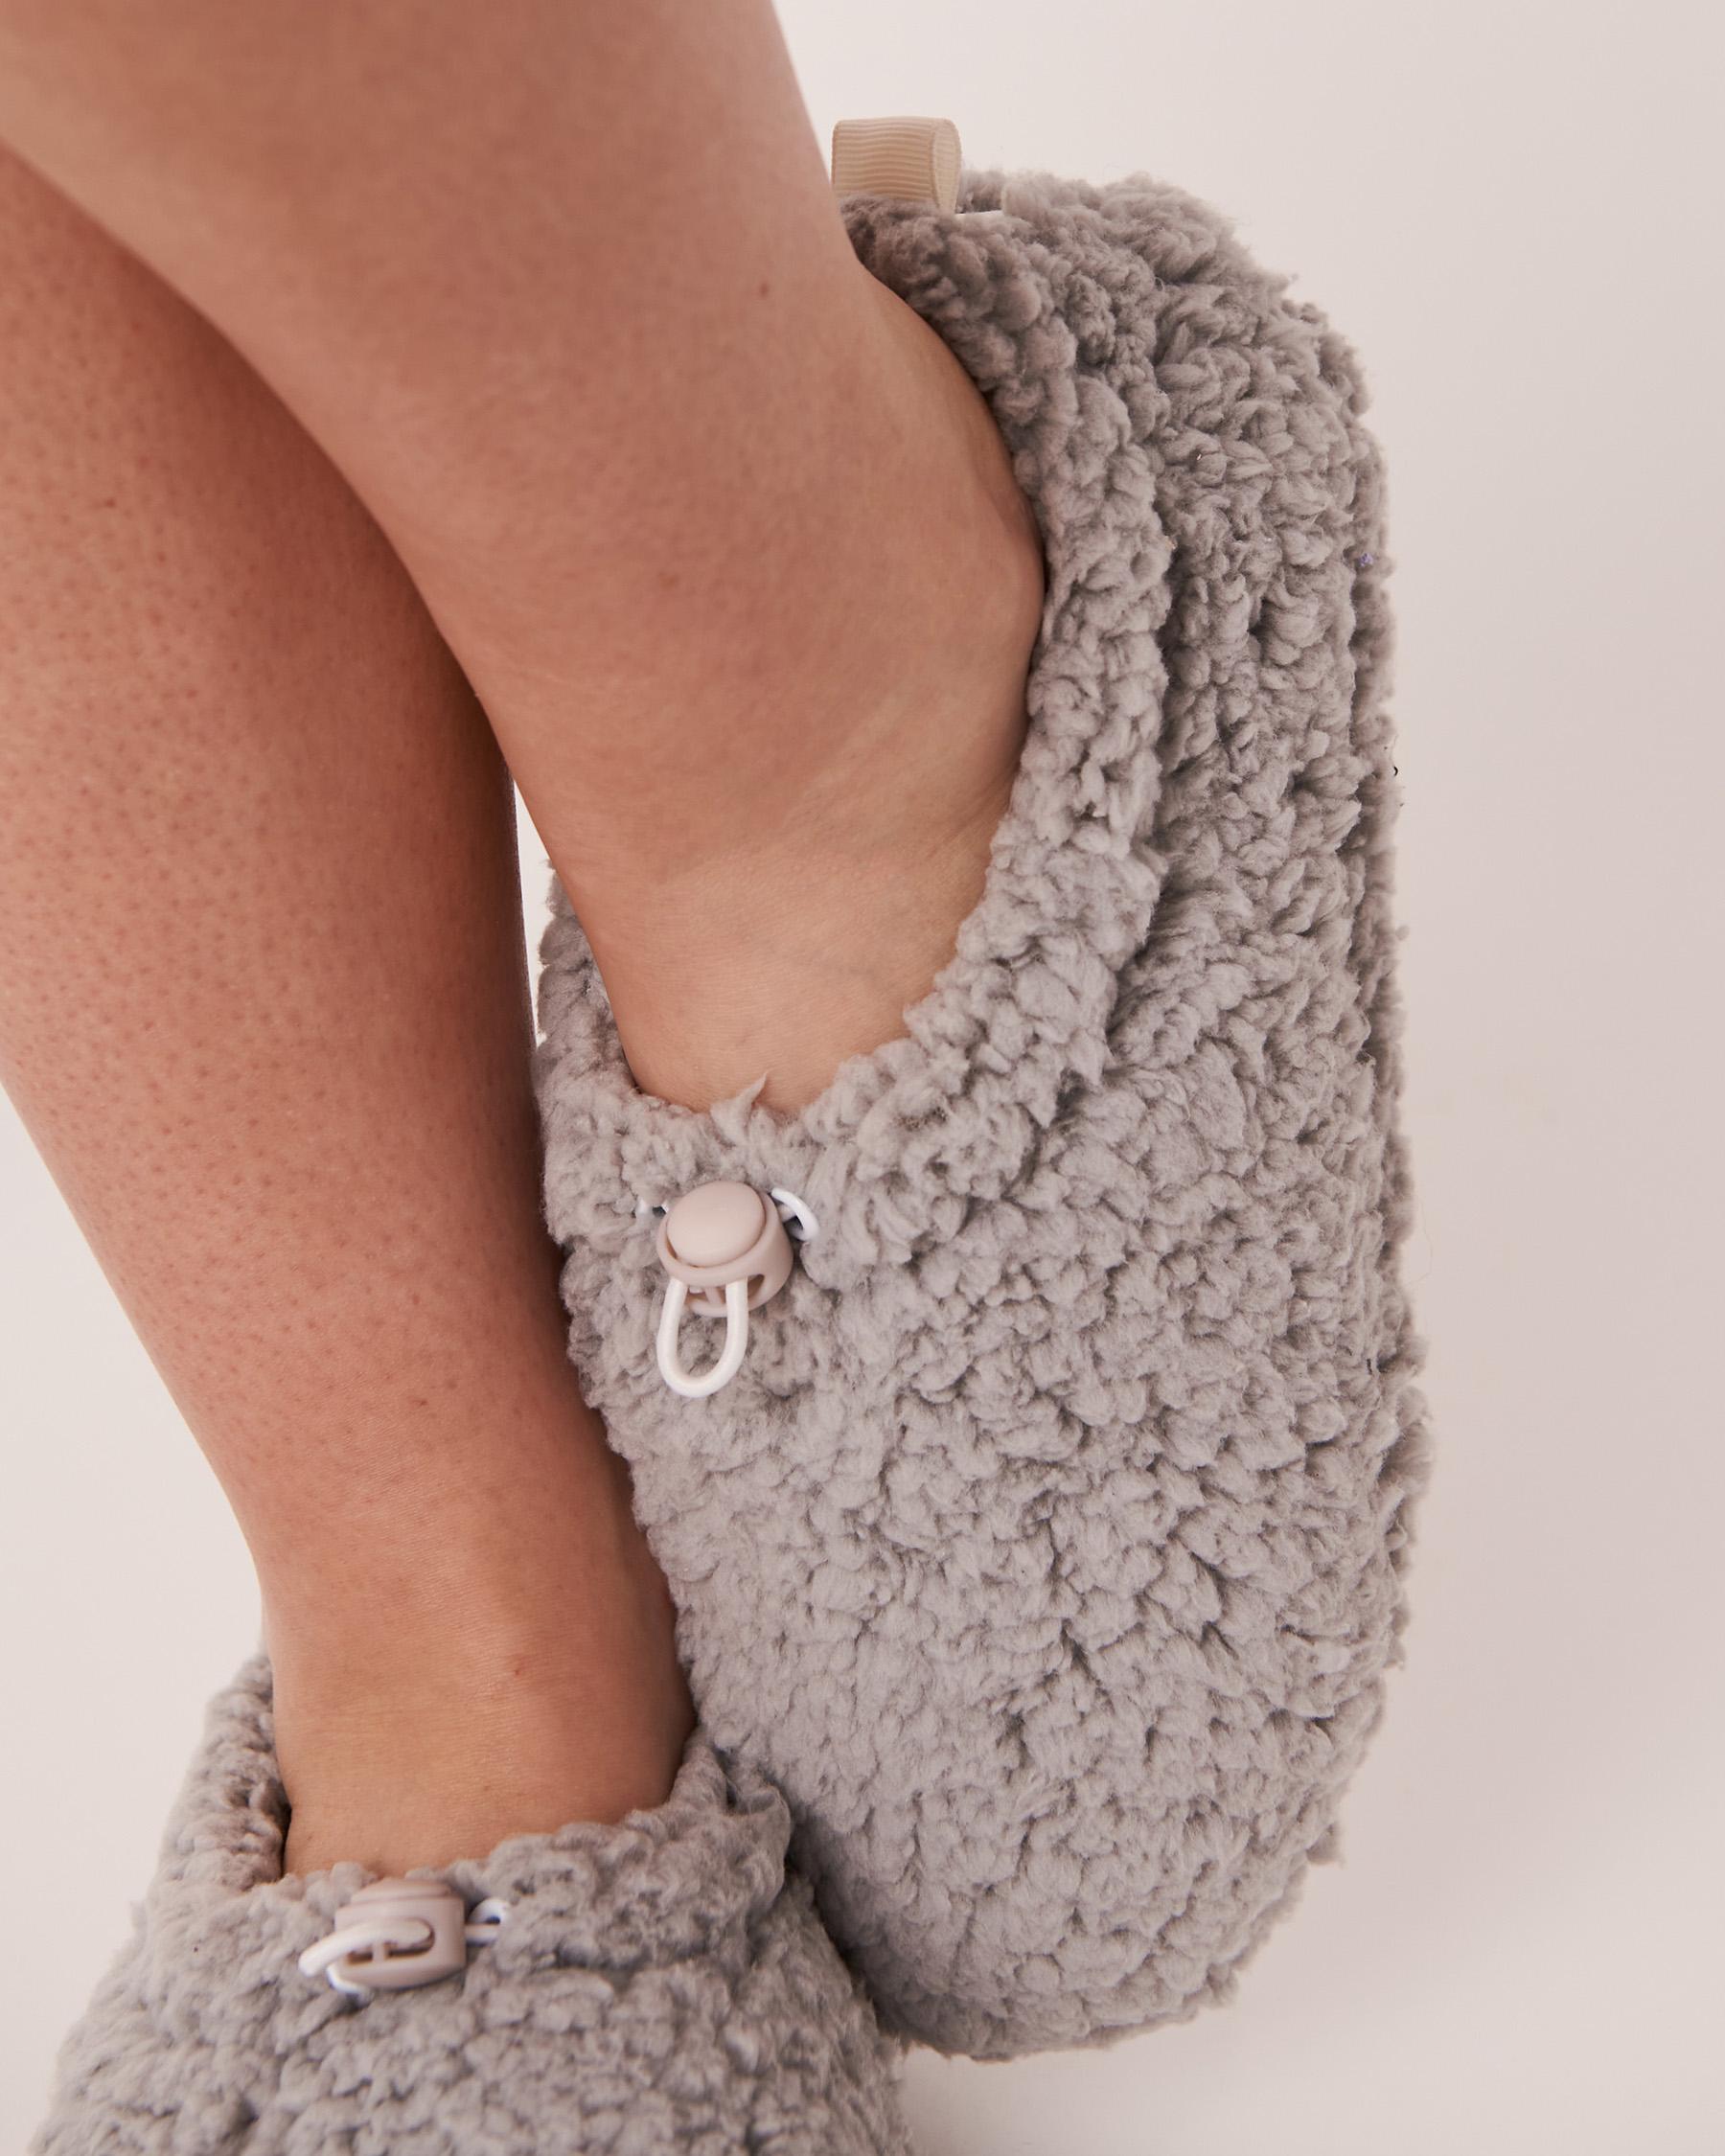 LA VIE EN ROSE Sherpa Bootie Slippers Grey 40700070 - View3